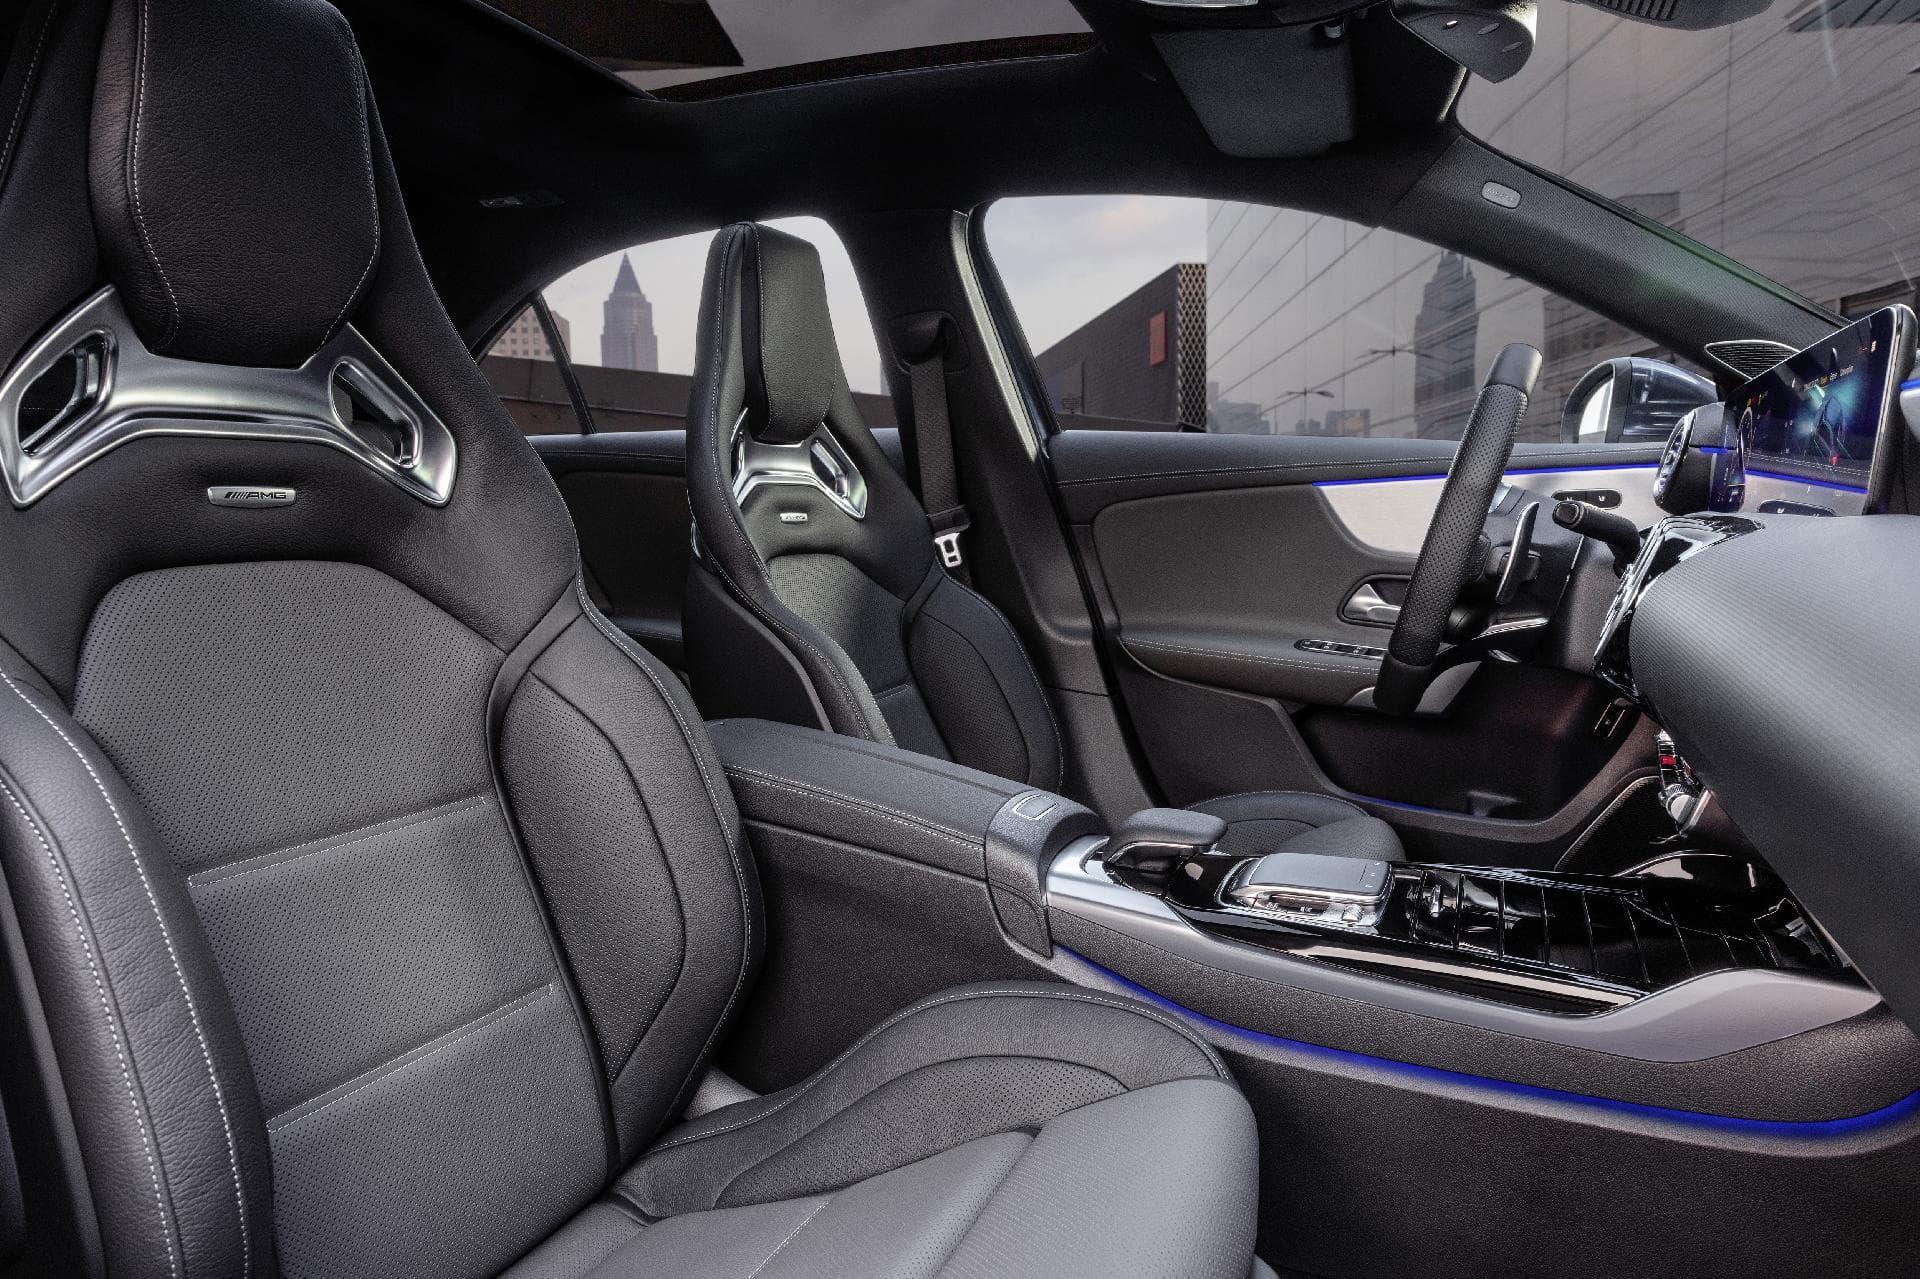 Mercedes Amg A35 Sedan 19c0171 067